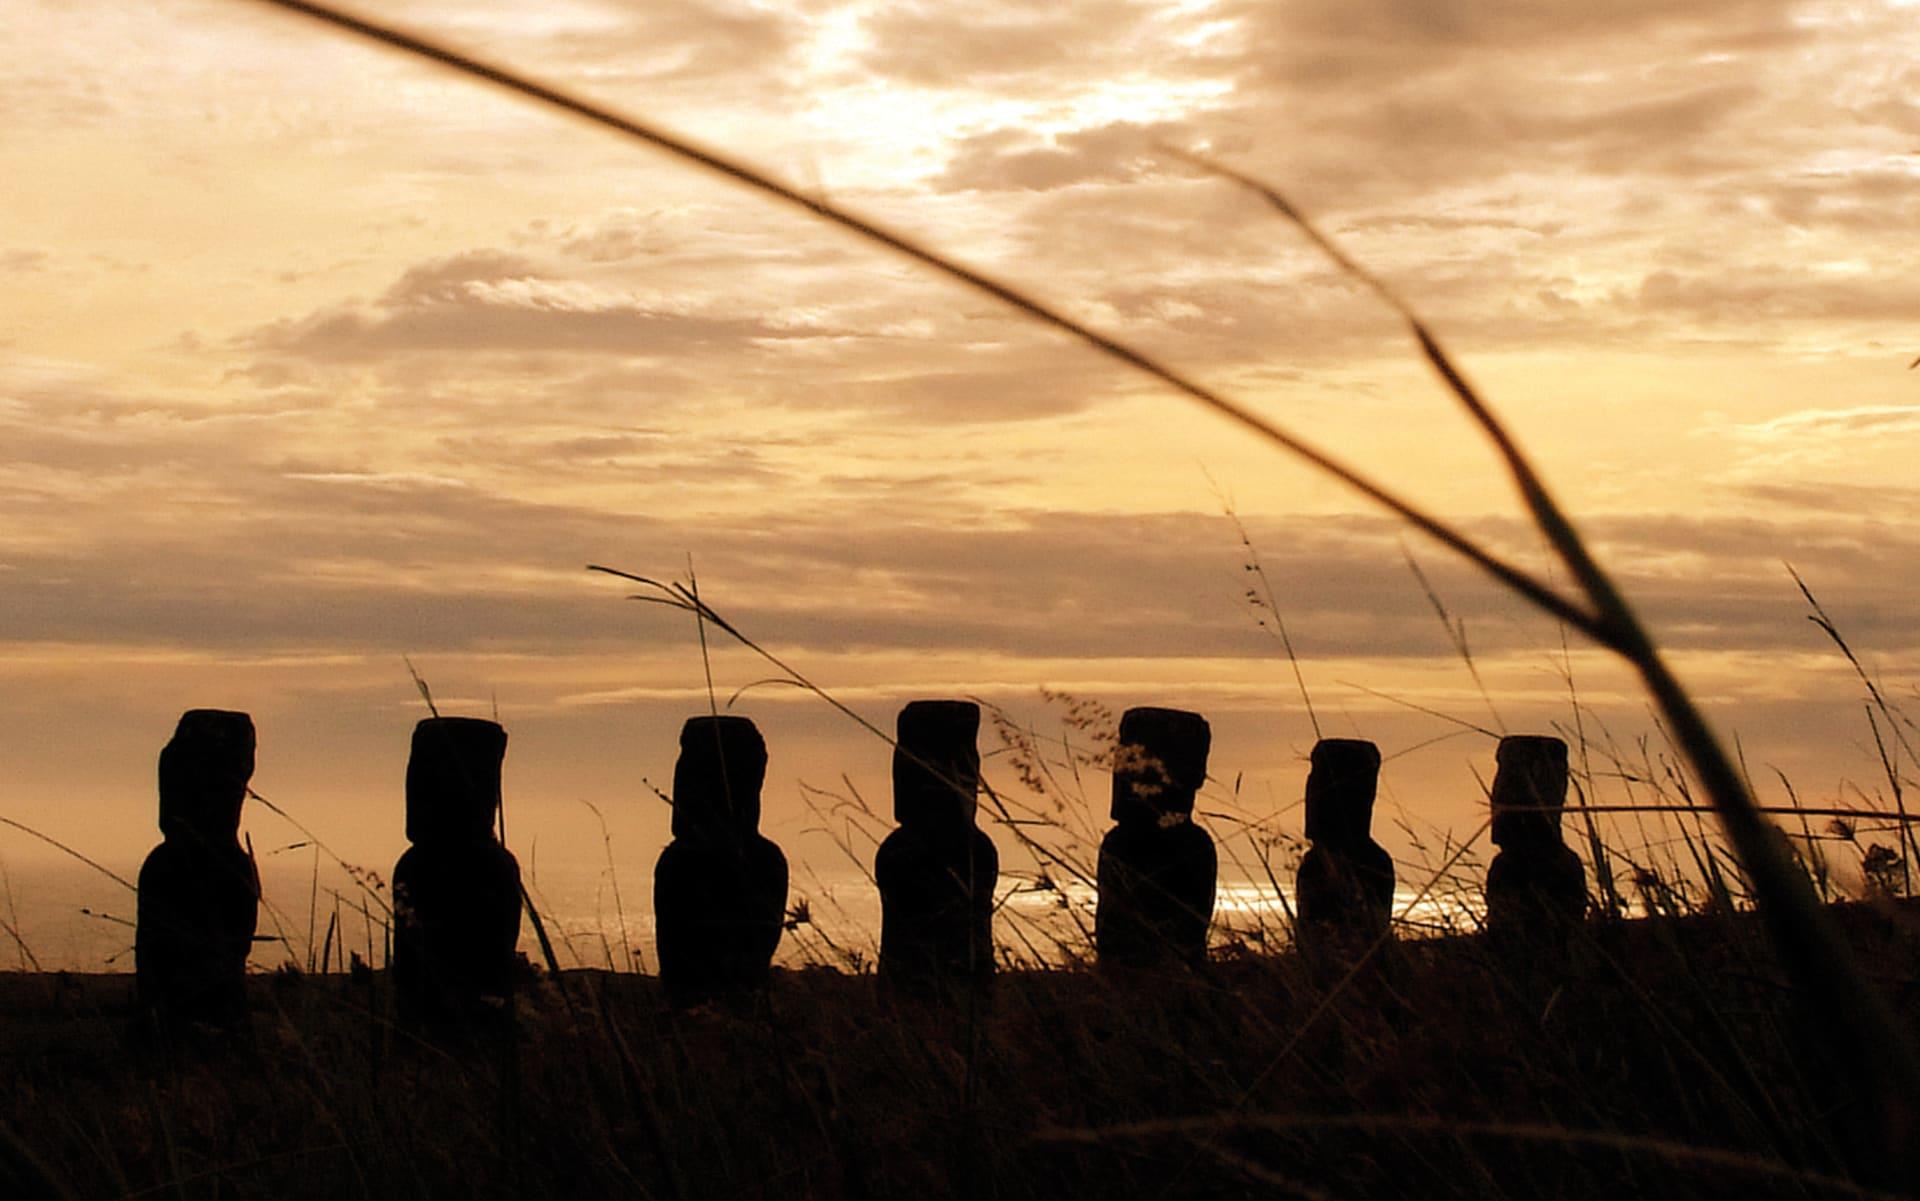 Zubucherreise Osterinsel - Ahus und Moaiis ab Hanga Roa: Osterinsel